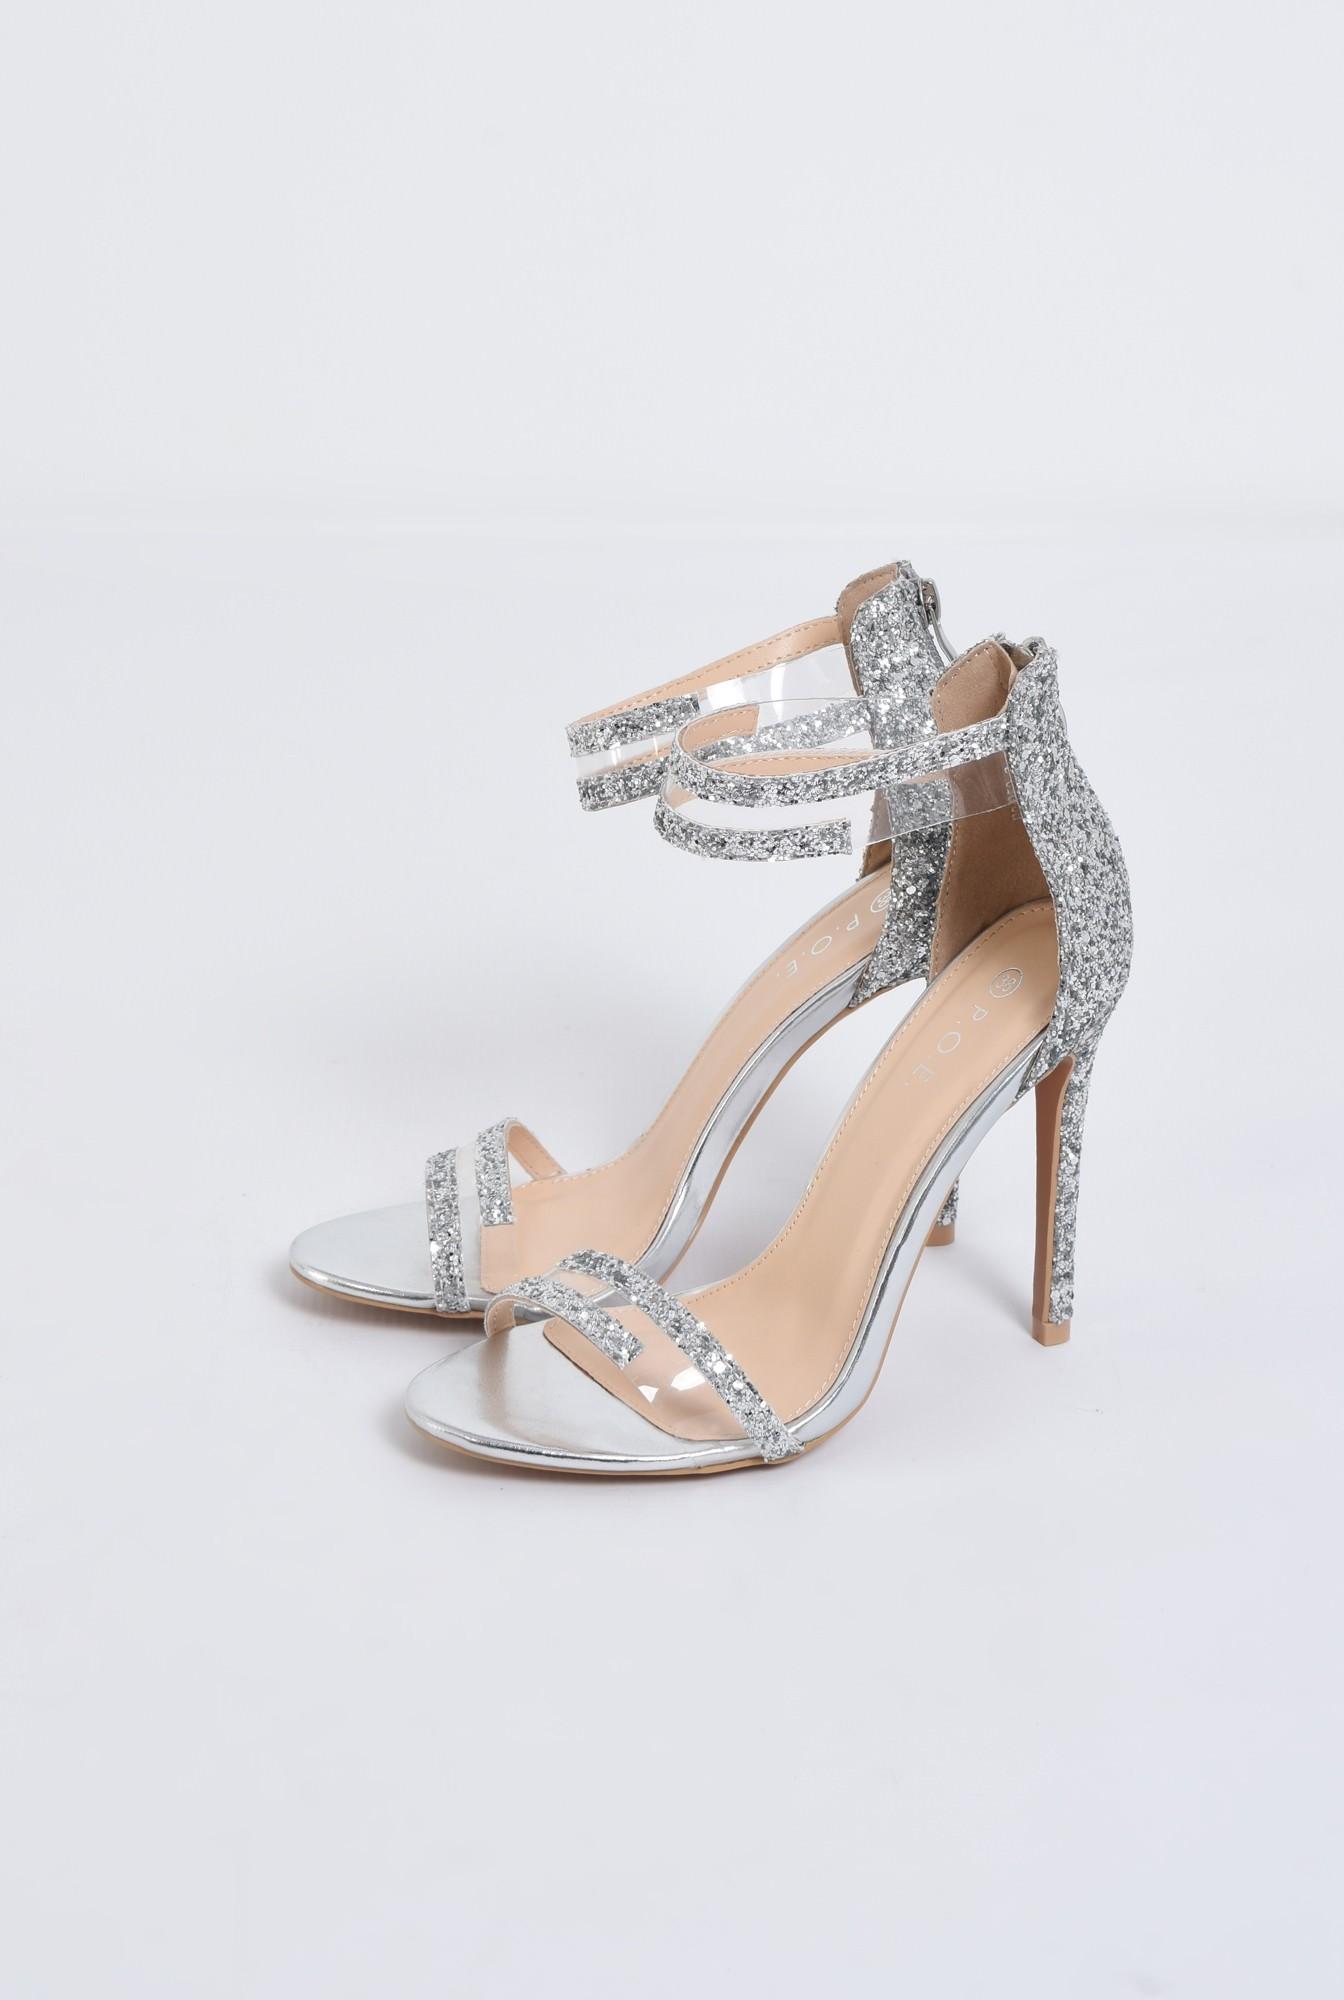 1 - sandale elegante, argintii, cu glitter, stiletto